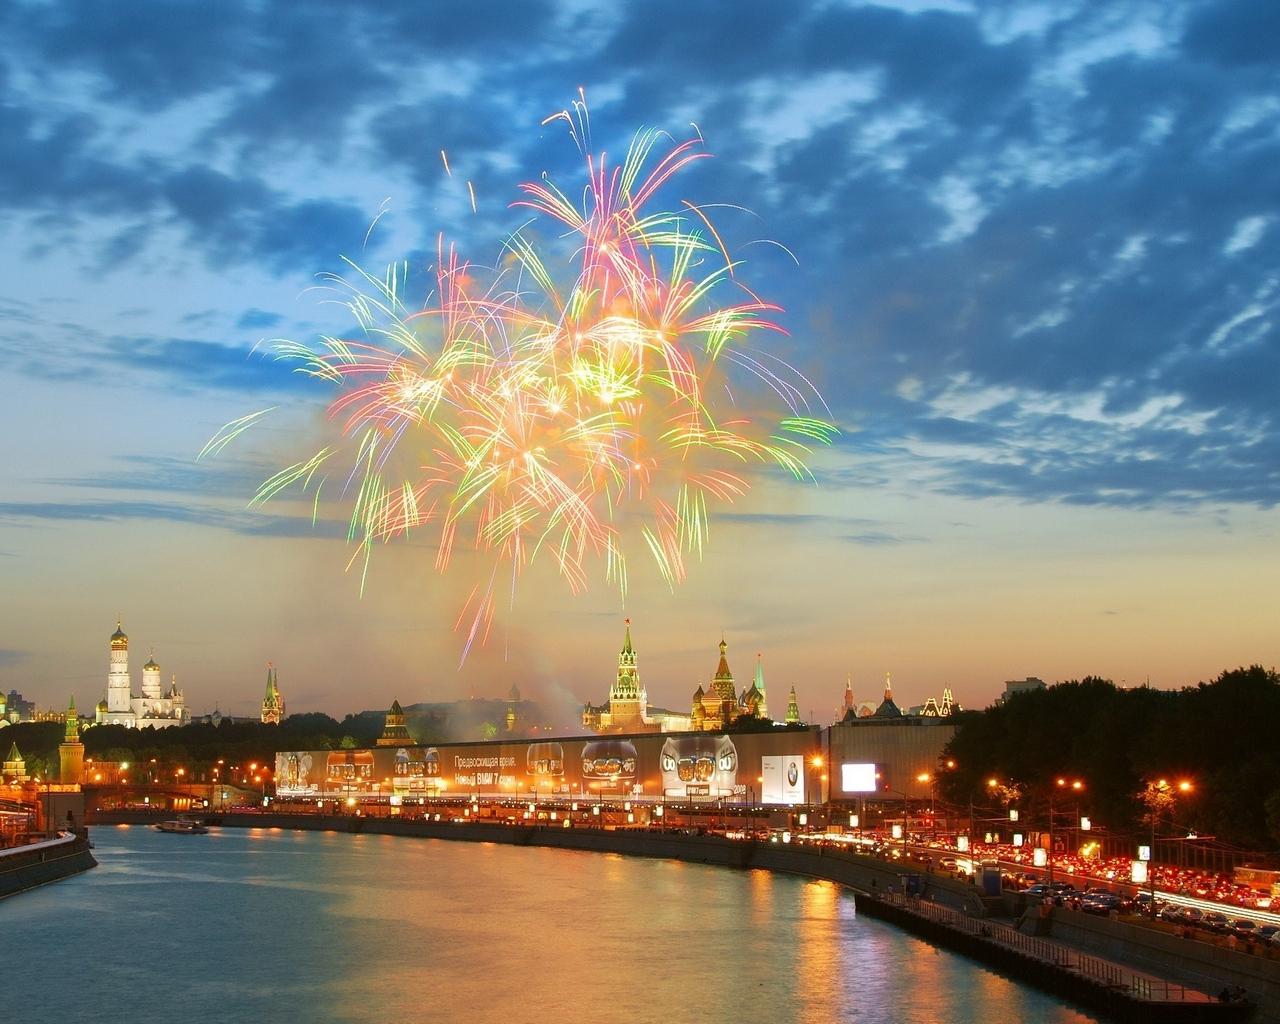 river_fireworks_kremlin_moscow_13749_1280x1024